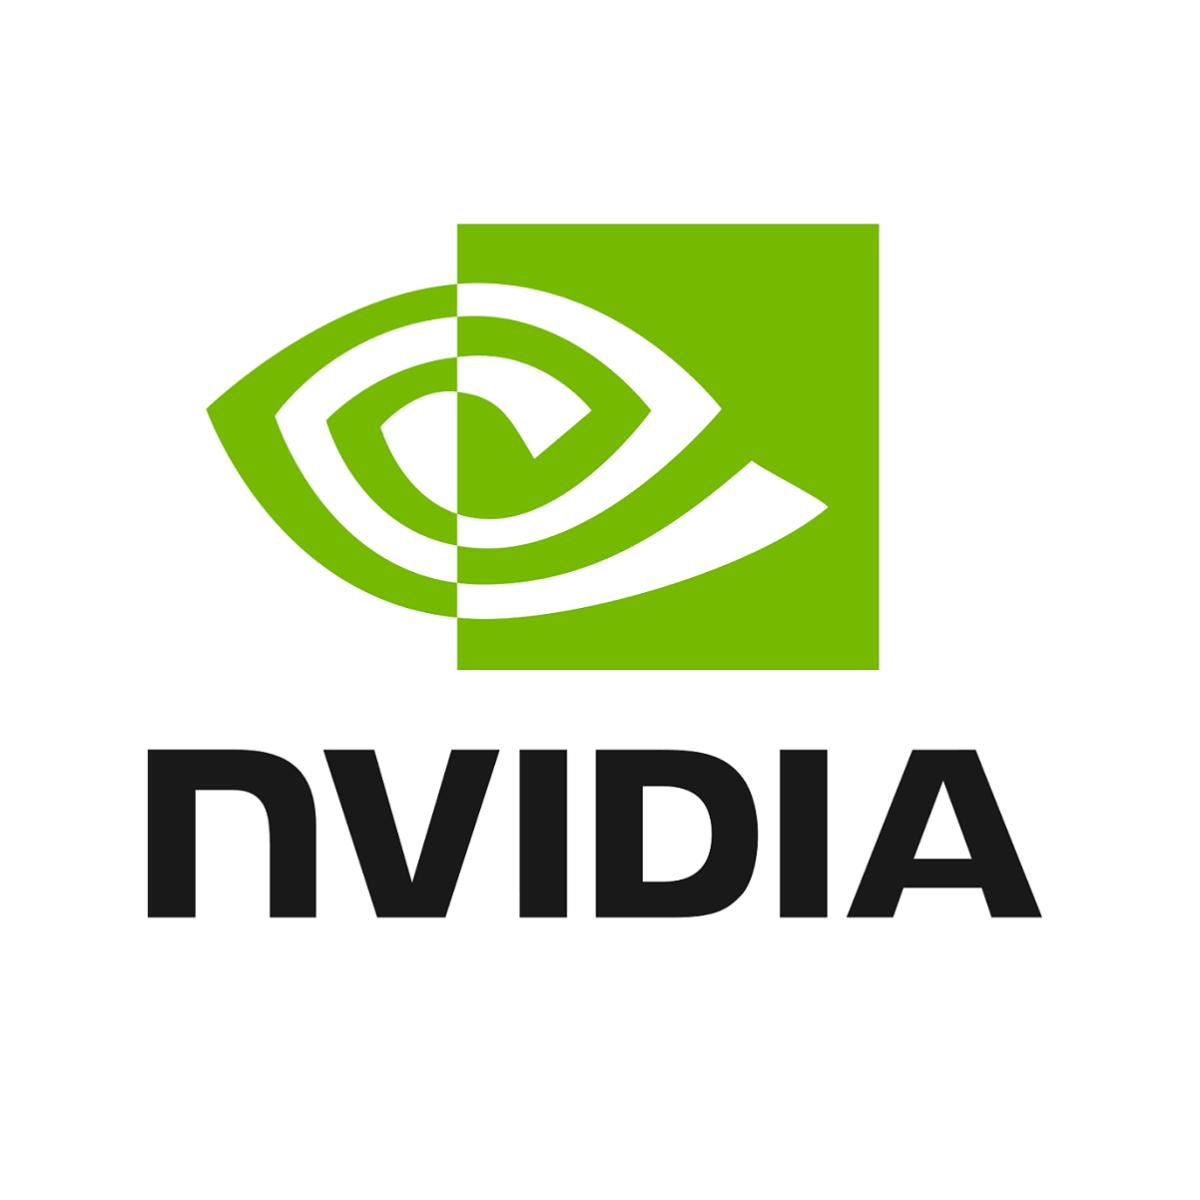 Nvidia-ohjaimia ei voi ladata Windows 10 [TECHNICIAN FIX]